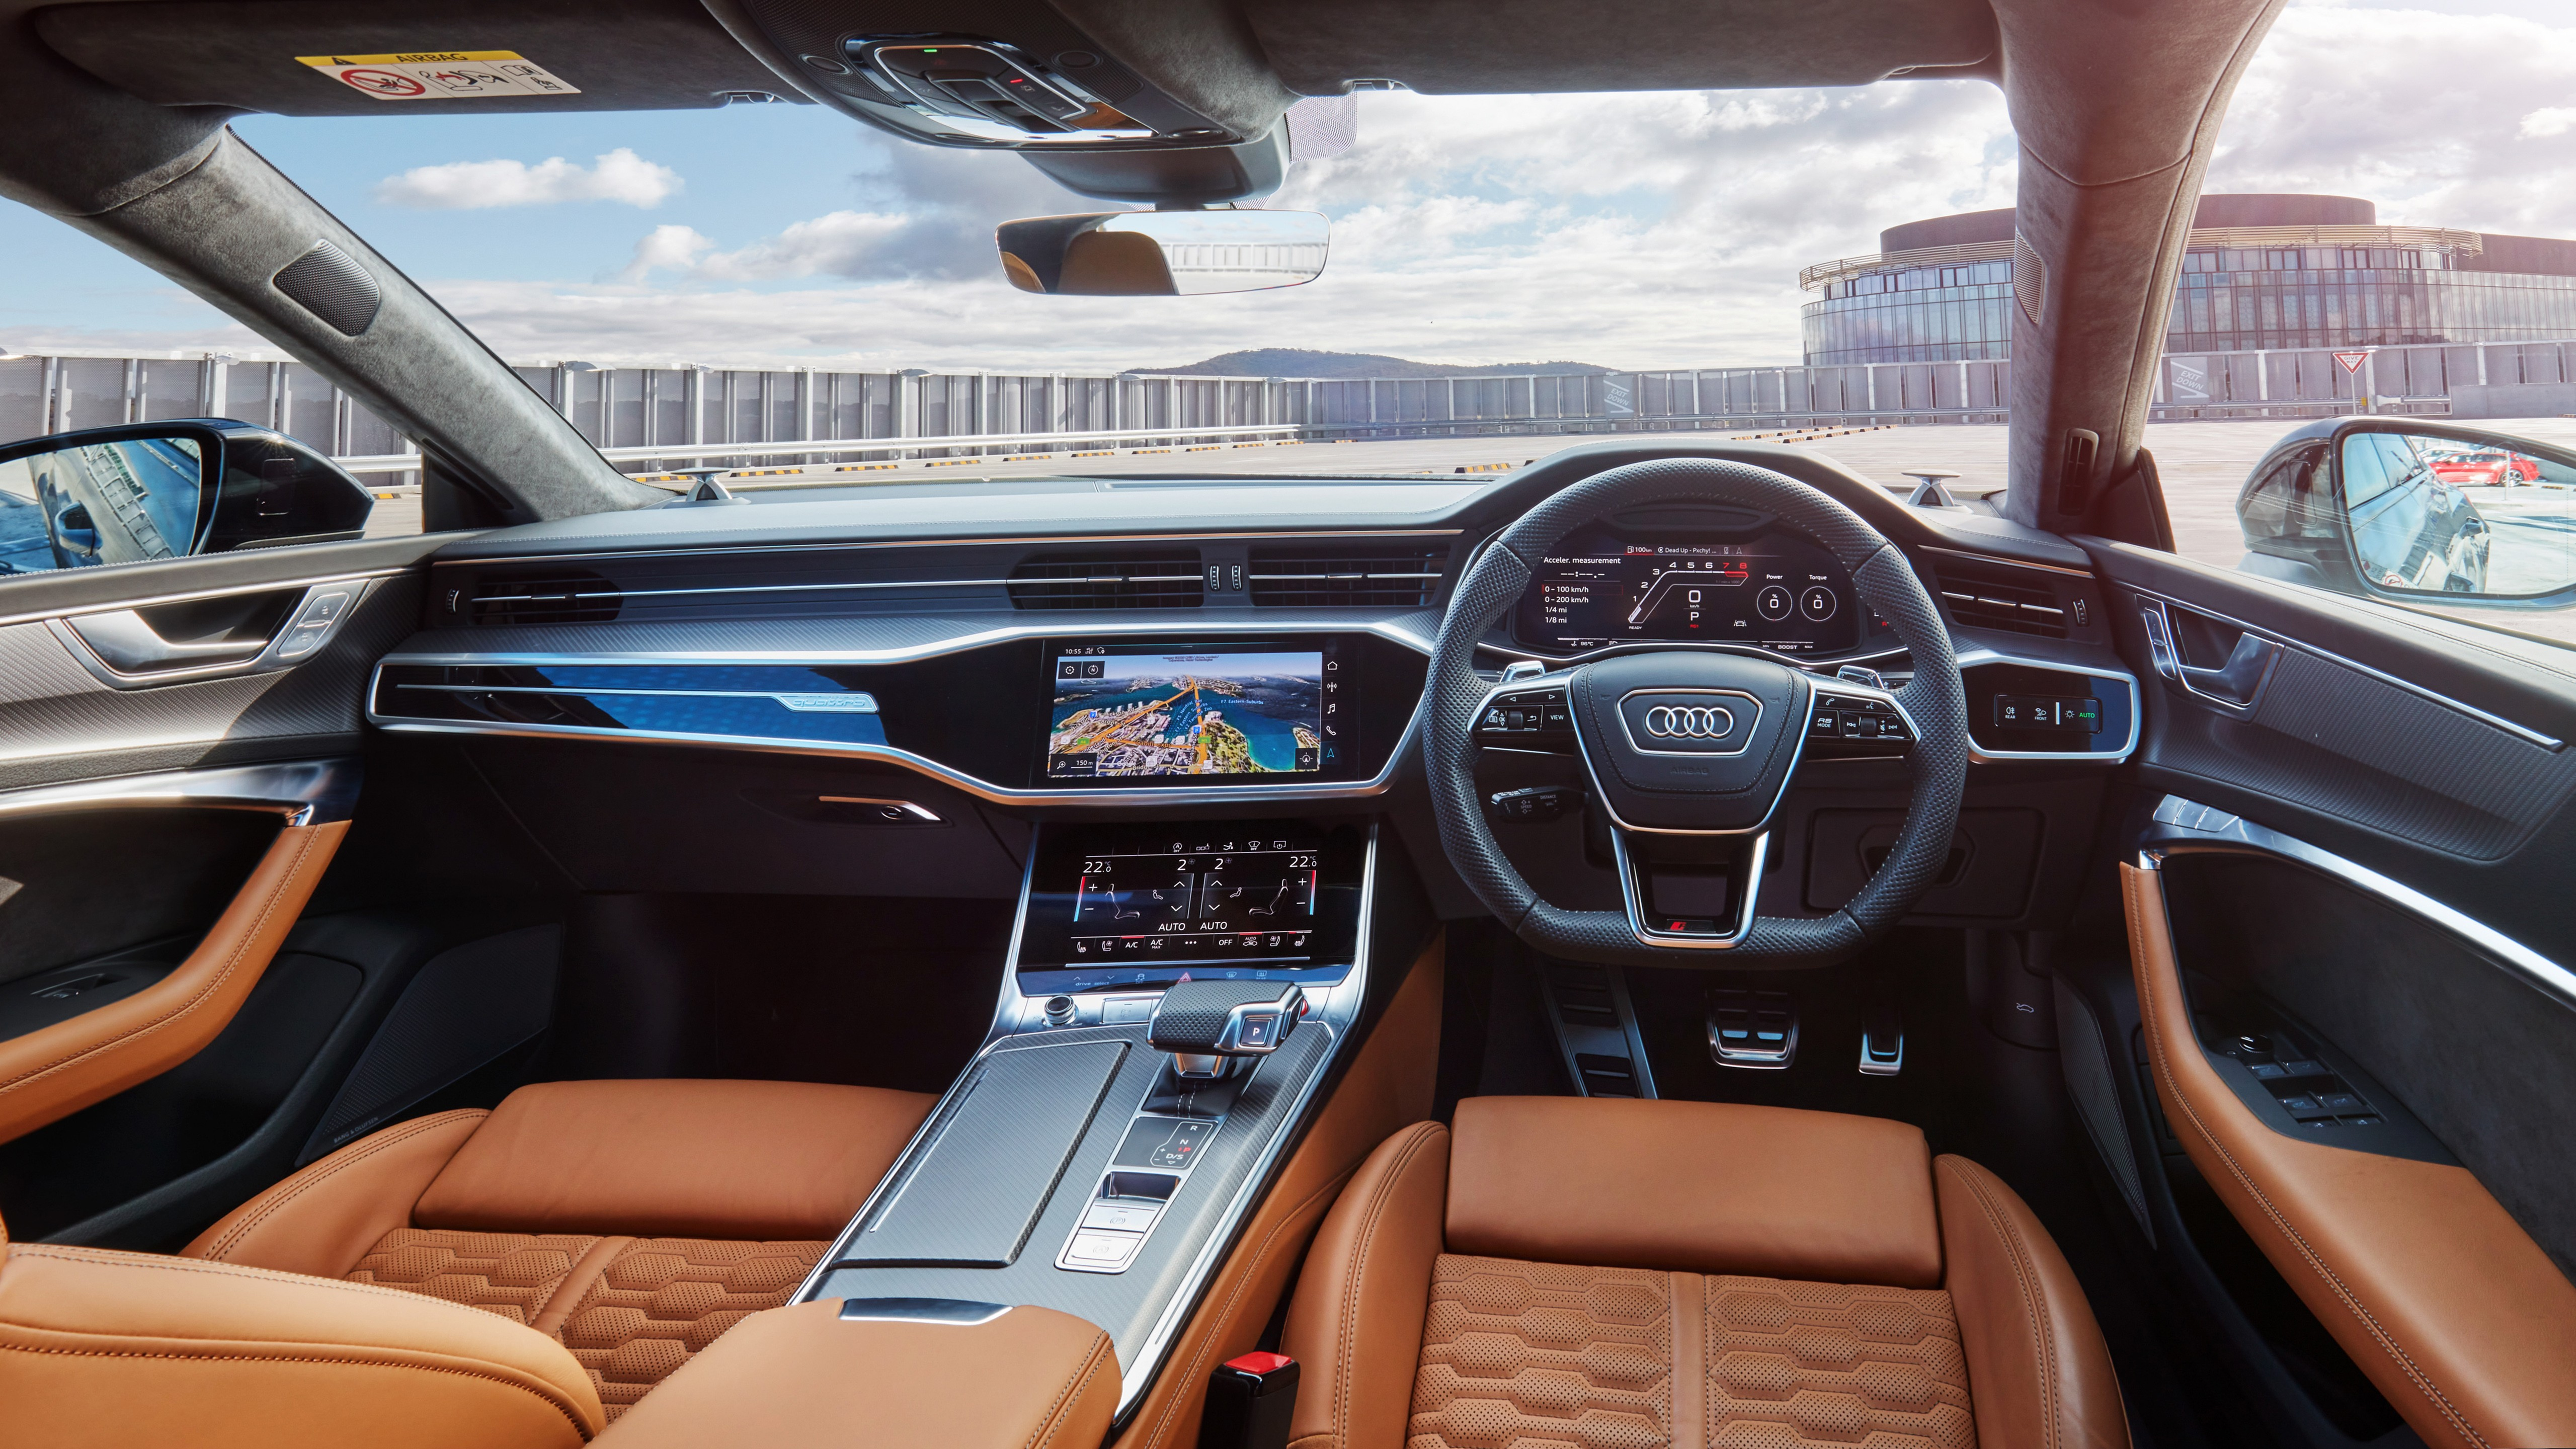 Audi Rs 7 Sportback 2020 5k Interior Wallpaper Hd Car Wallpapers Id 15113